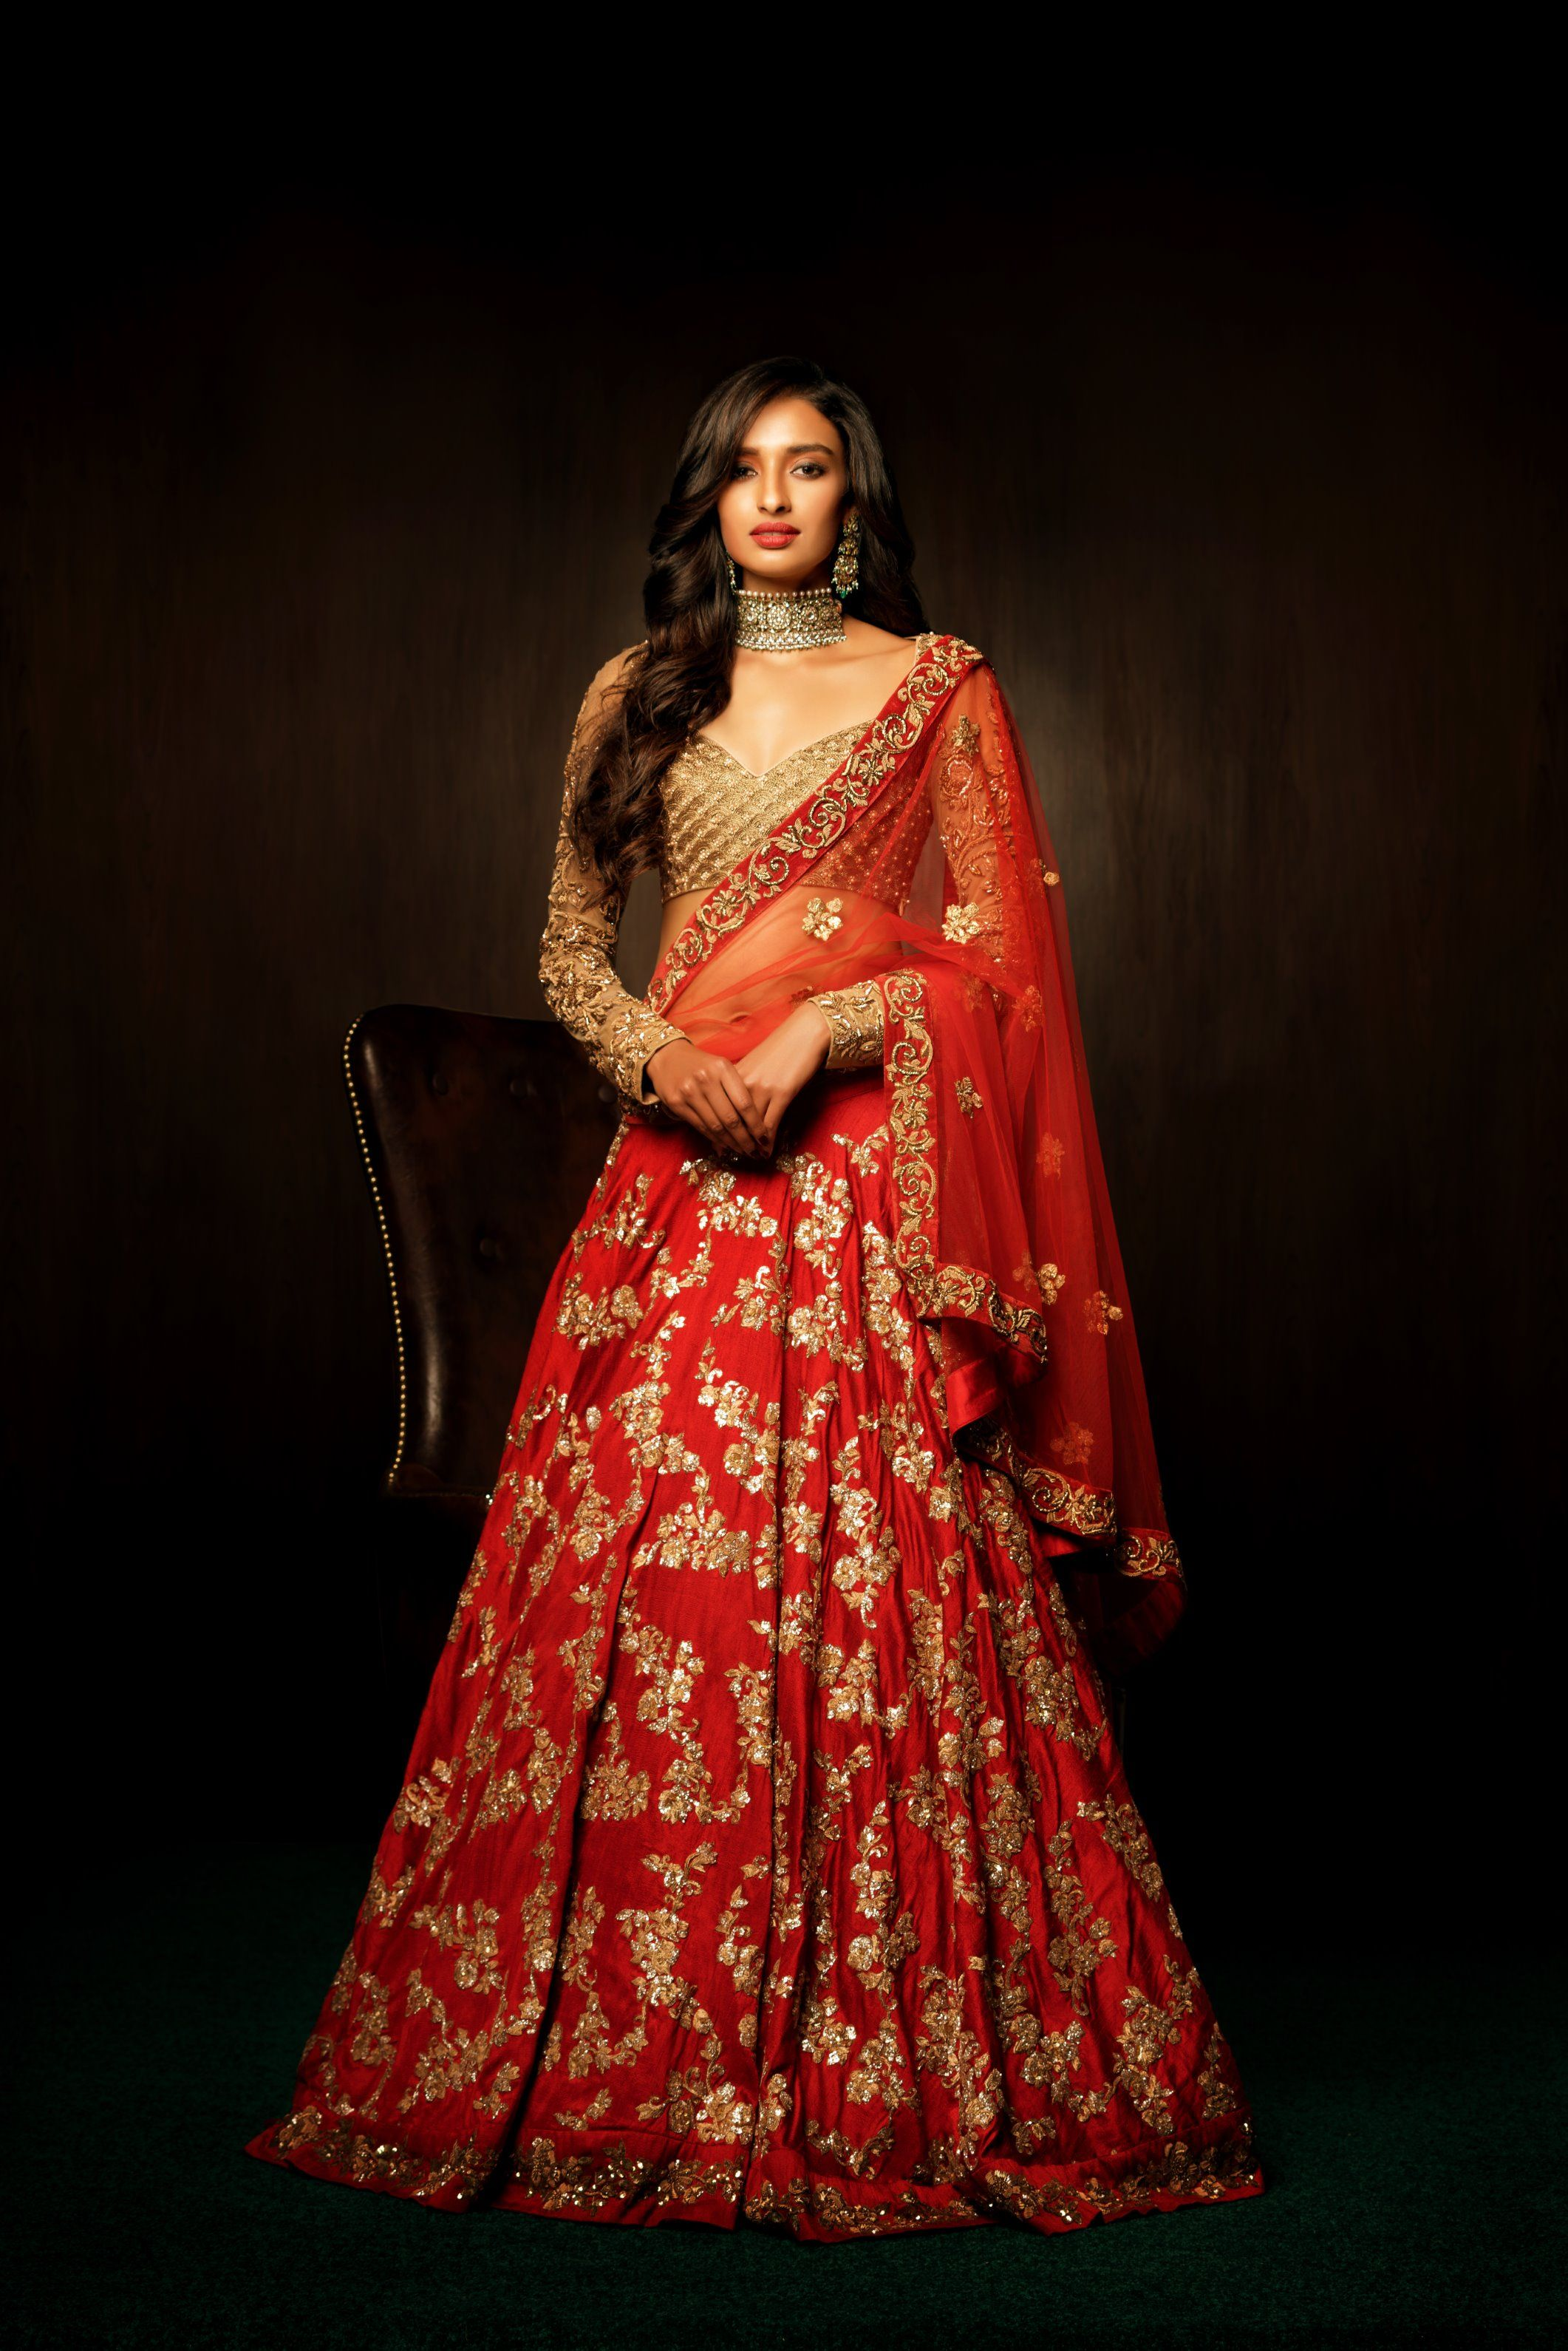 lehenga bridal blouse gold indian designs reception floral embroidery wedmegood cut wear sleeves lehanga outfits dresses champagne modern lehengas heavy